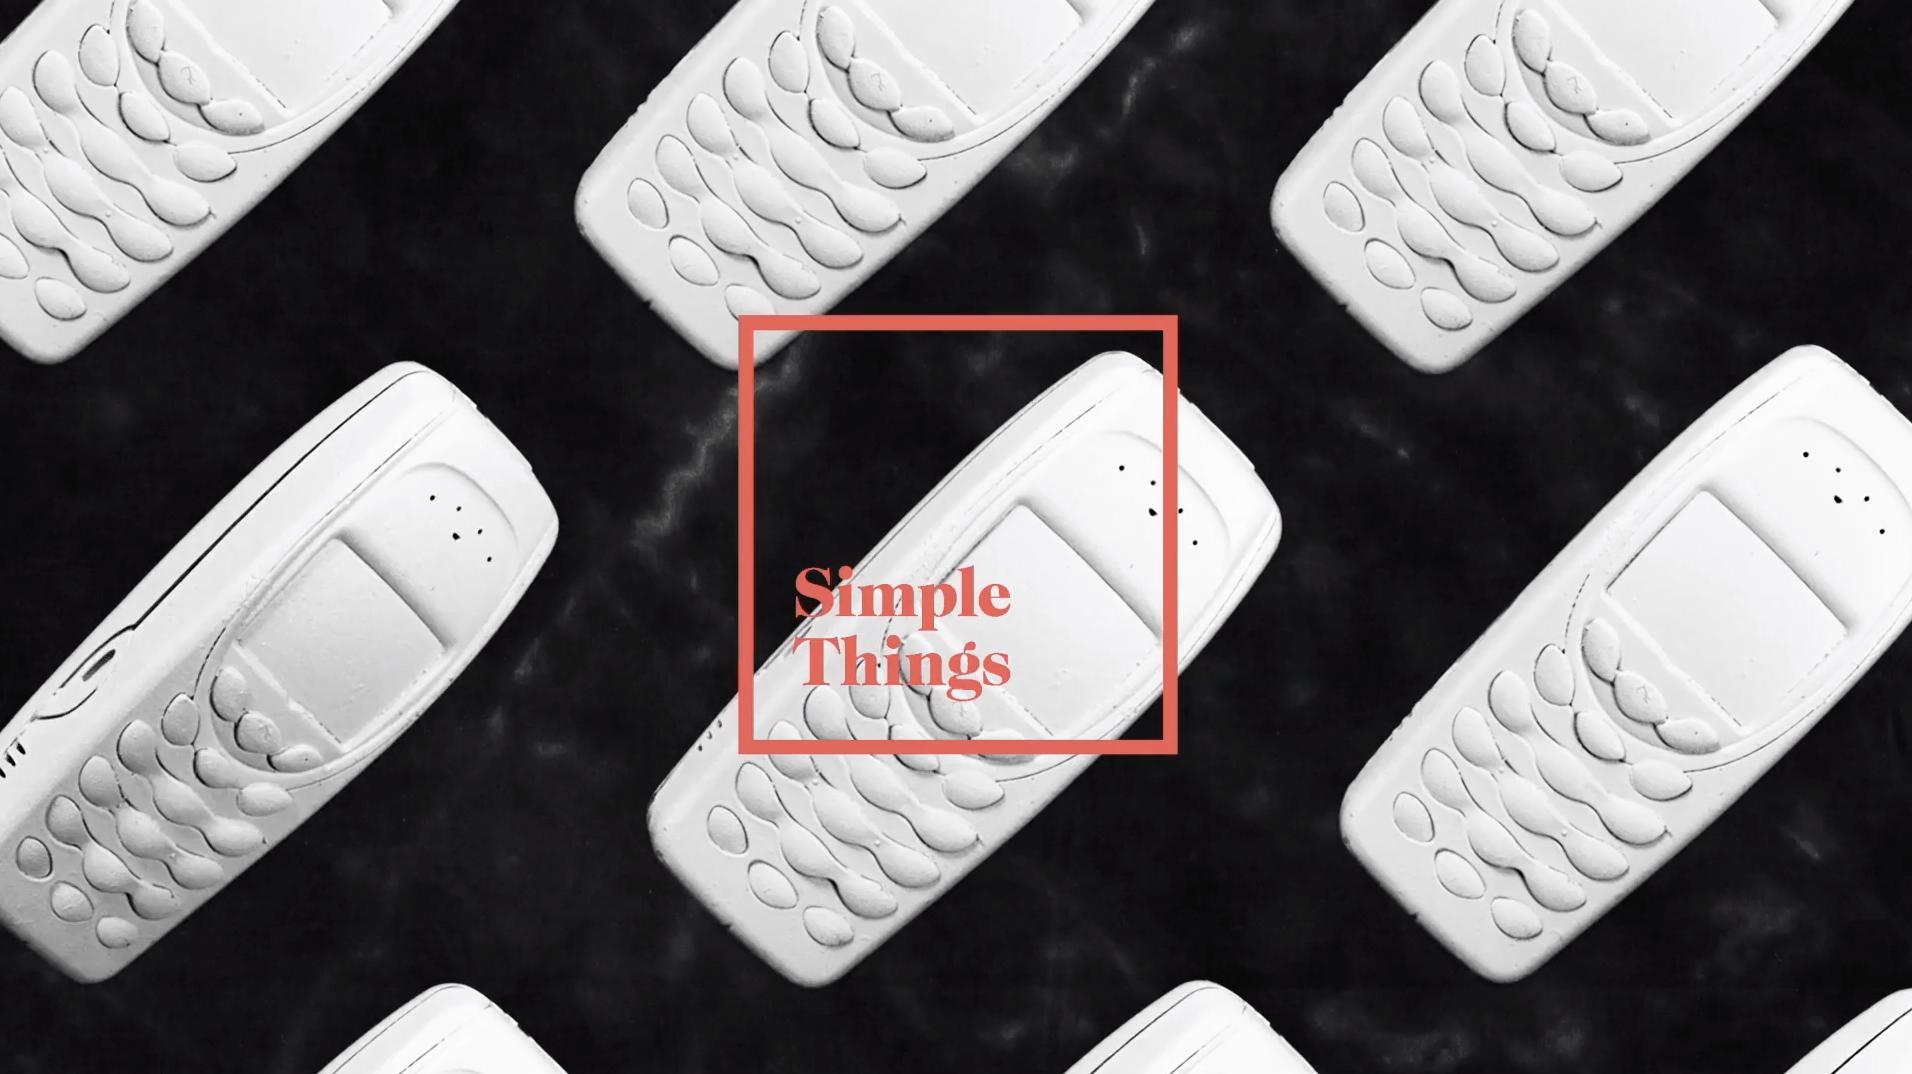 CARHARTT X SIMPLE THINGS